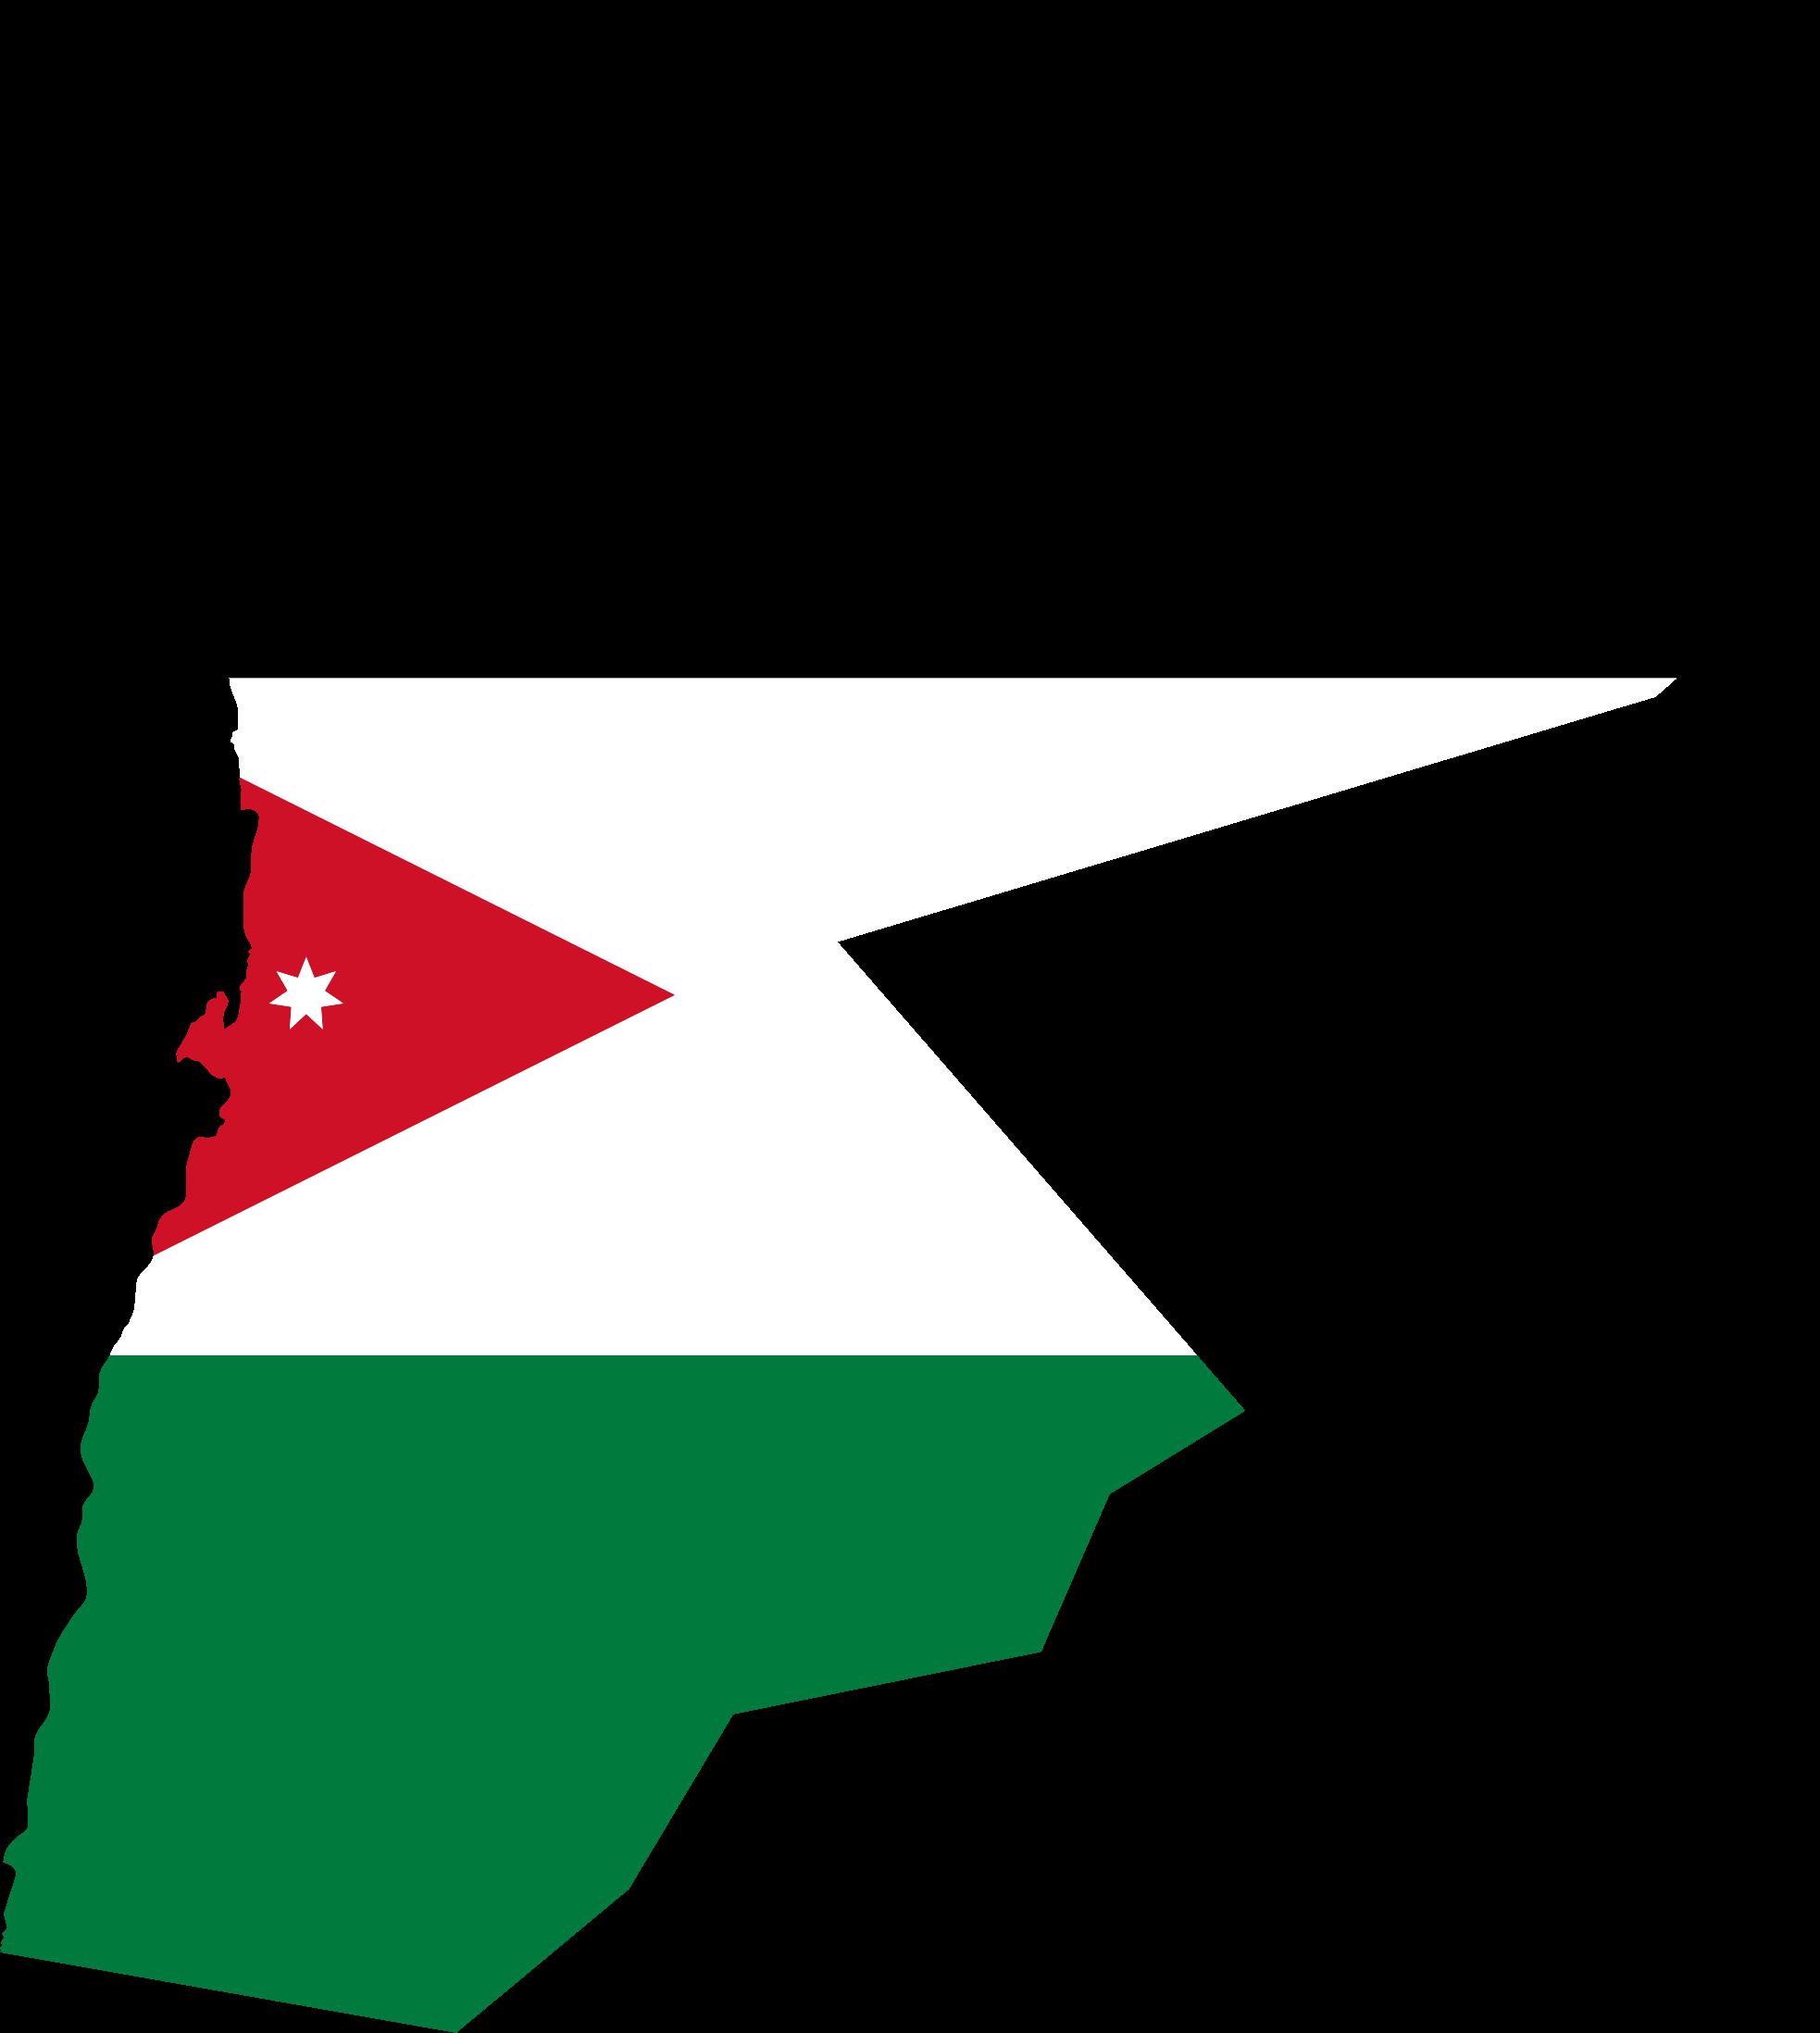 BIG IMAGE (PNG) - Jordan Map PNG